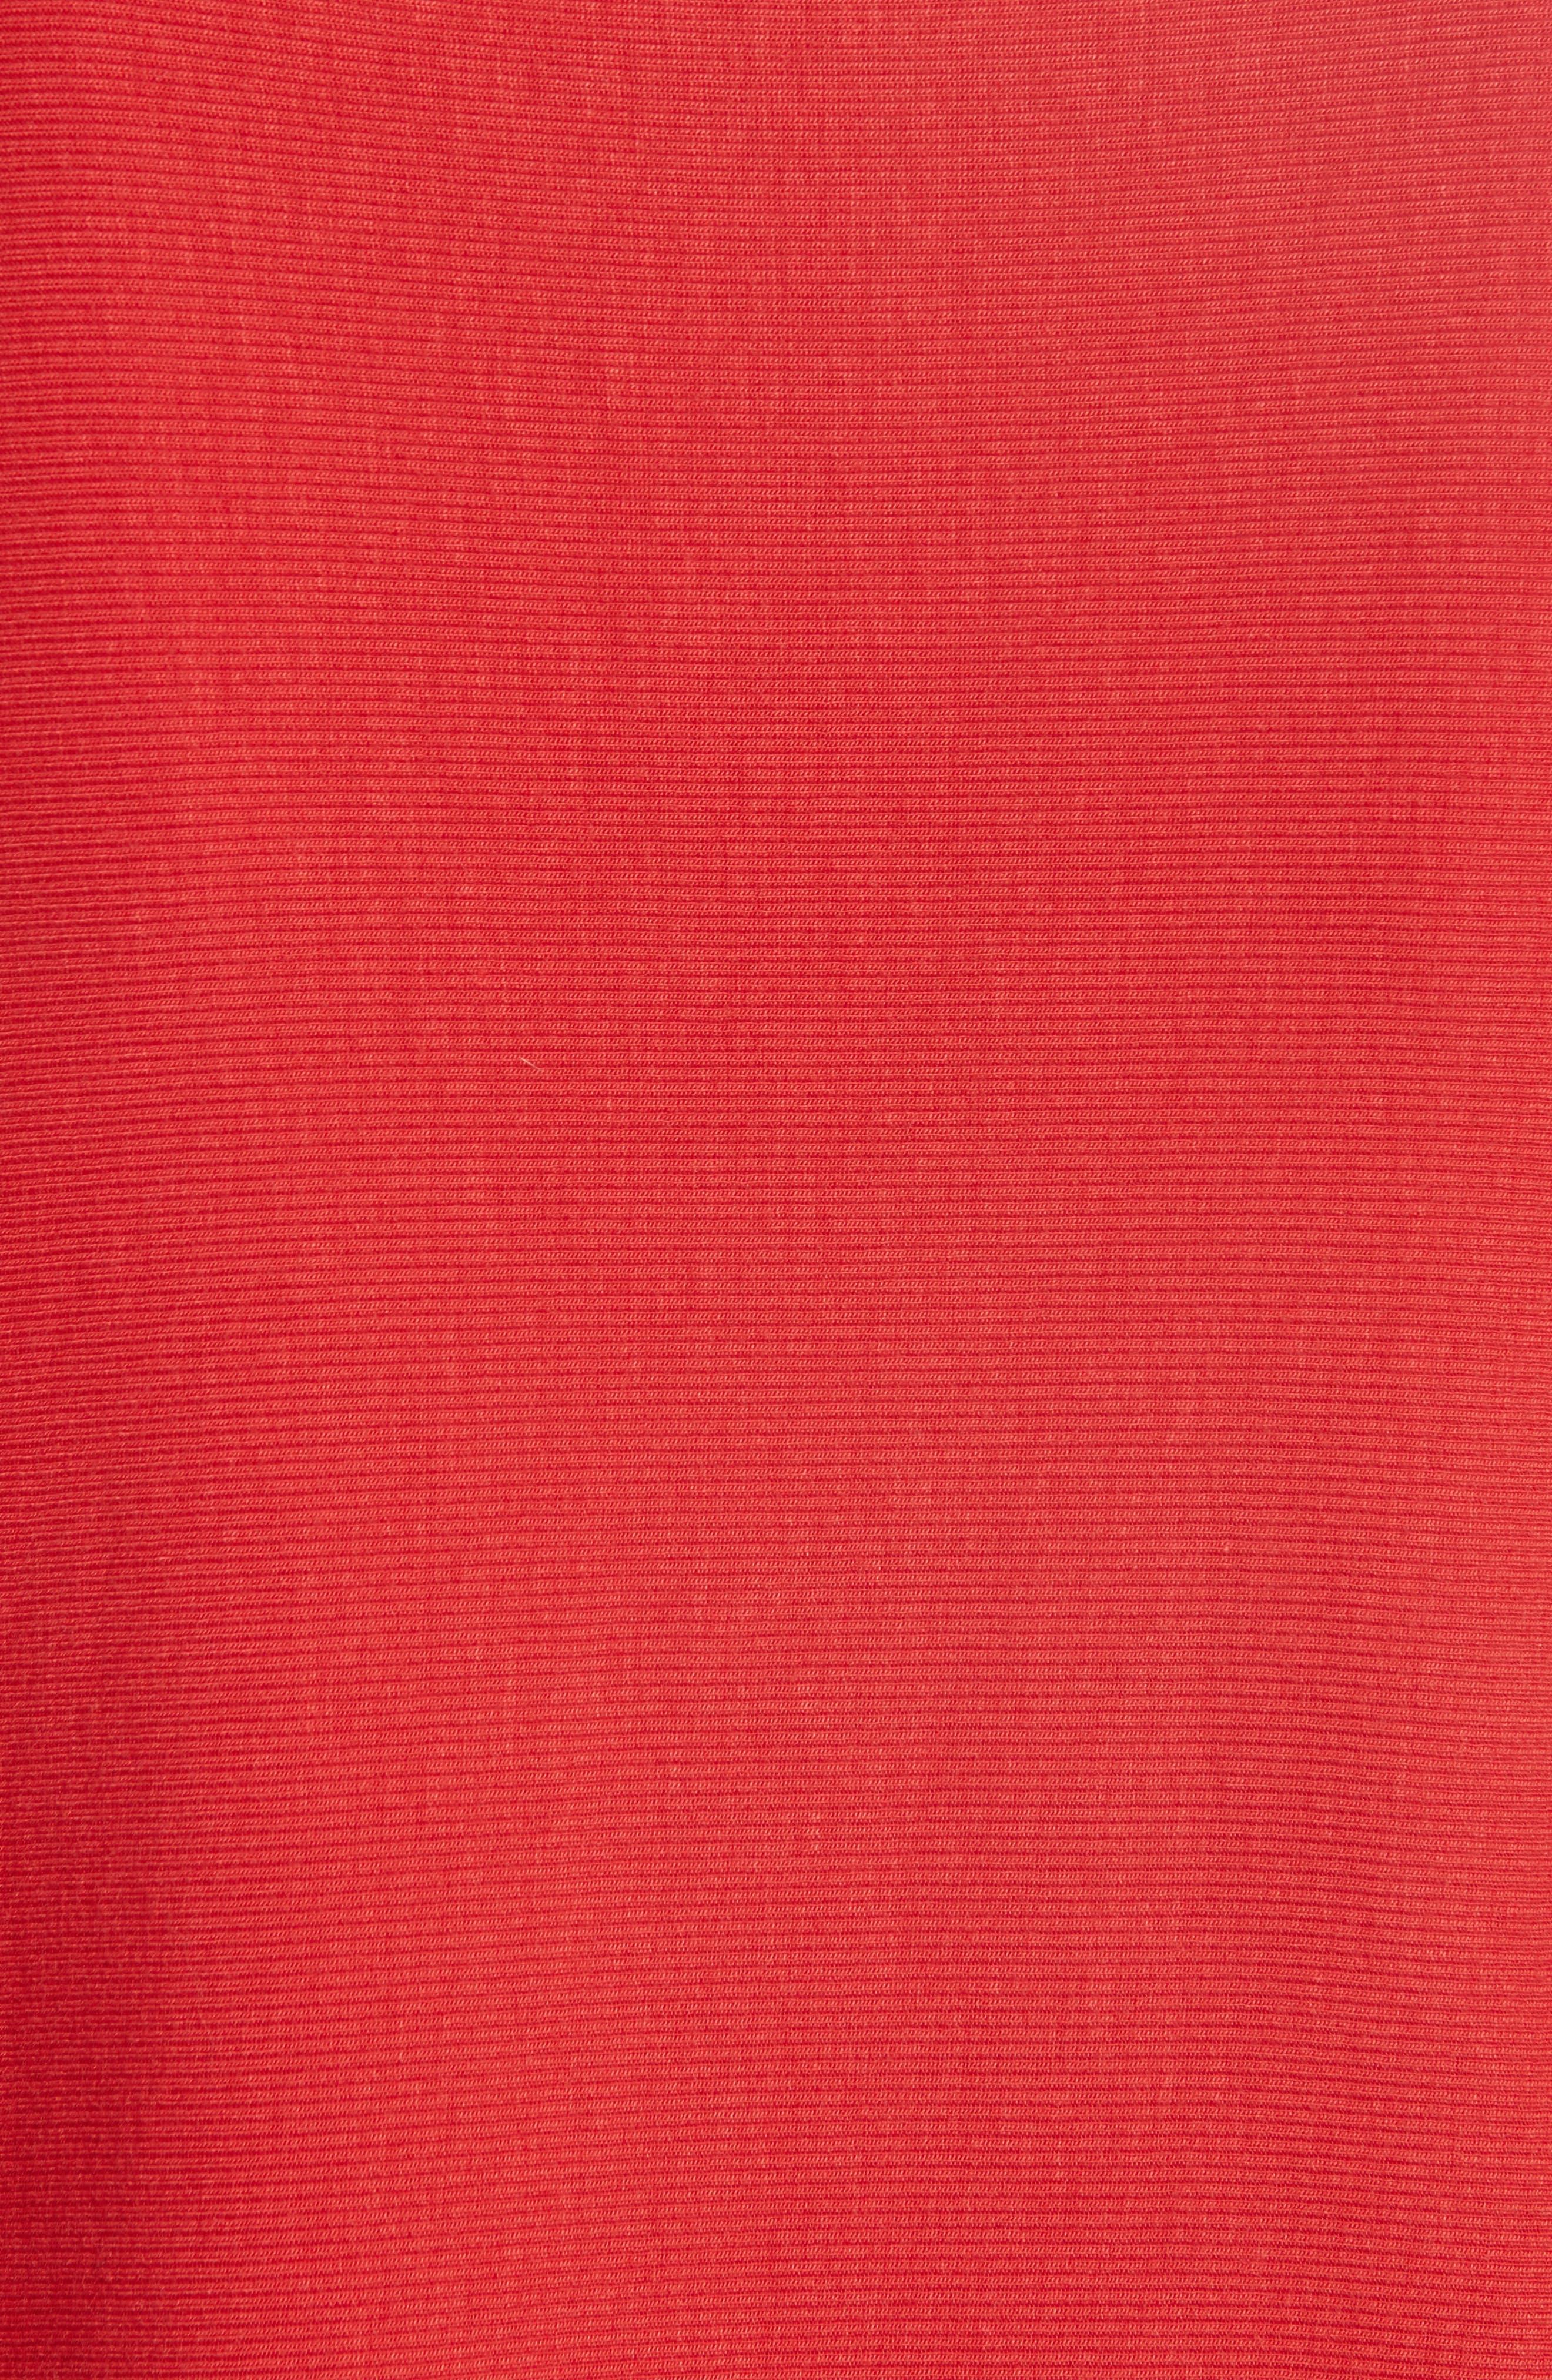 Alameda Turtleneck Top,                             Alternate thumbnail 5, color,                             Red